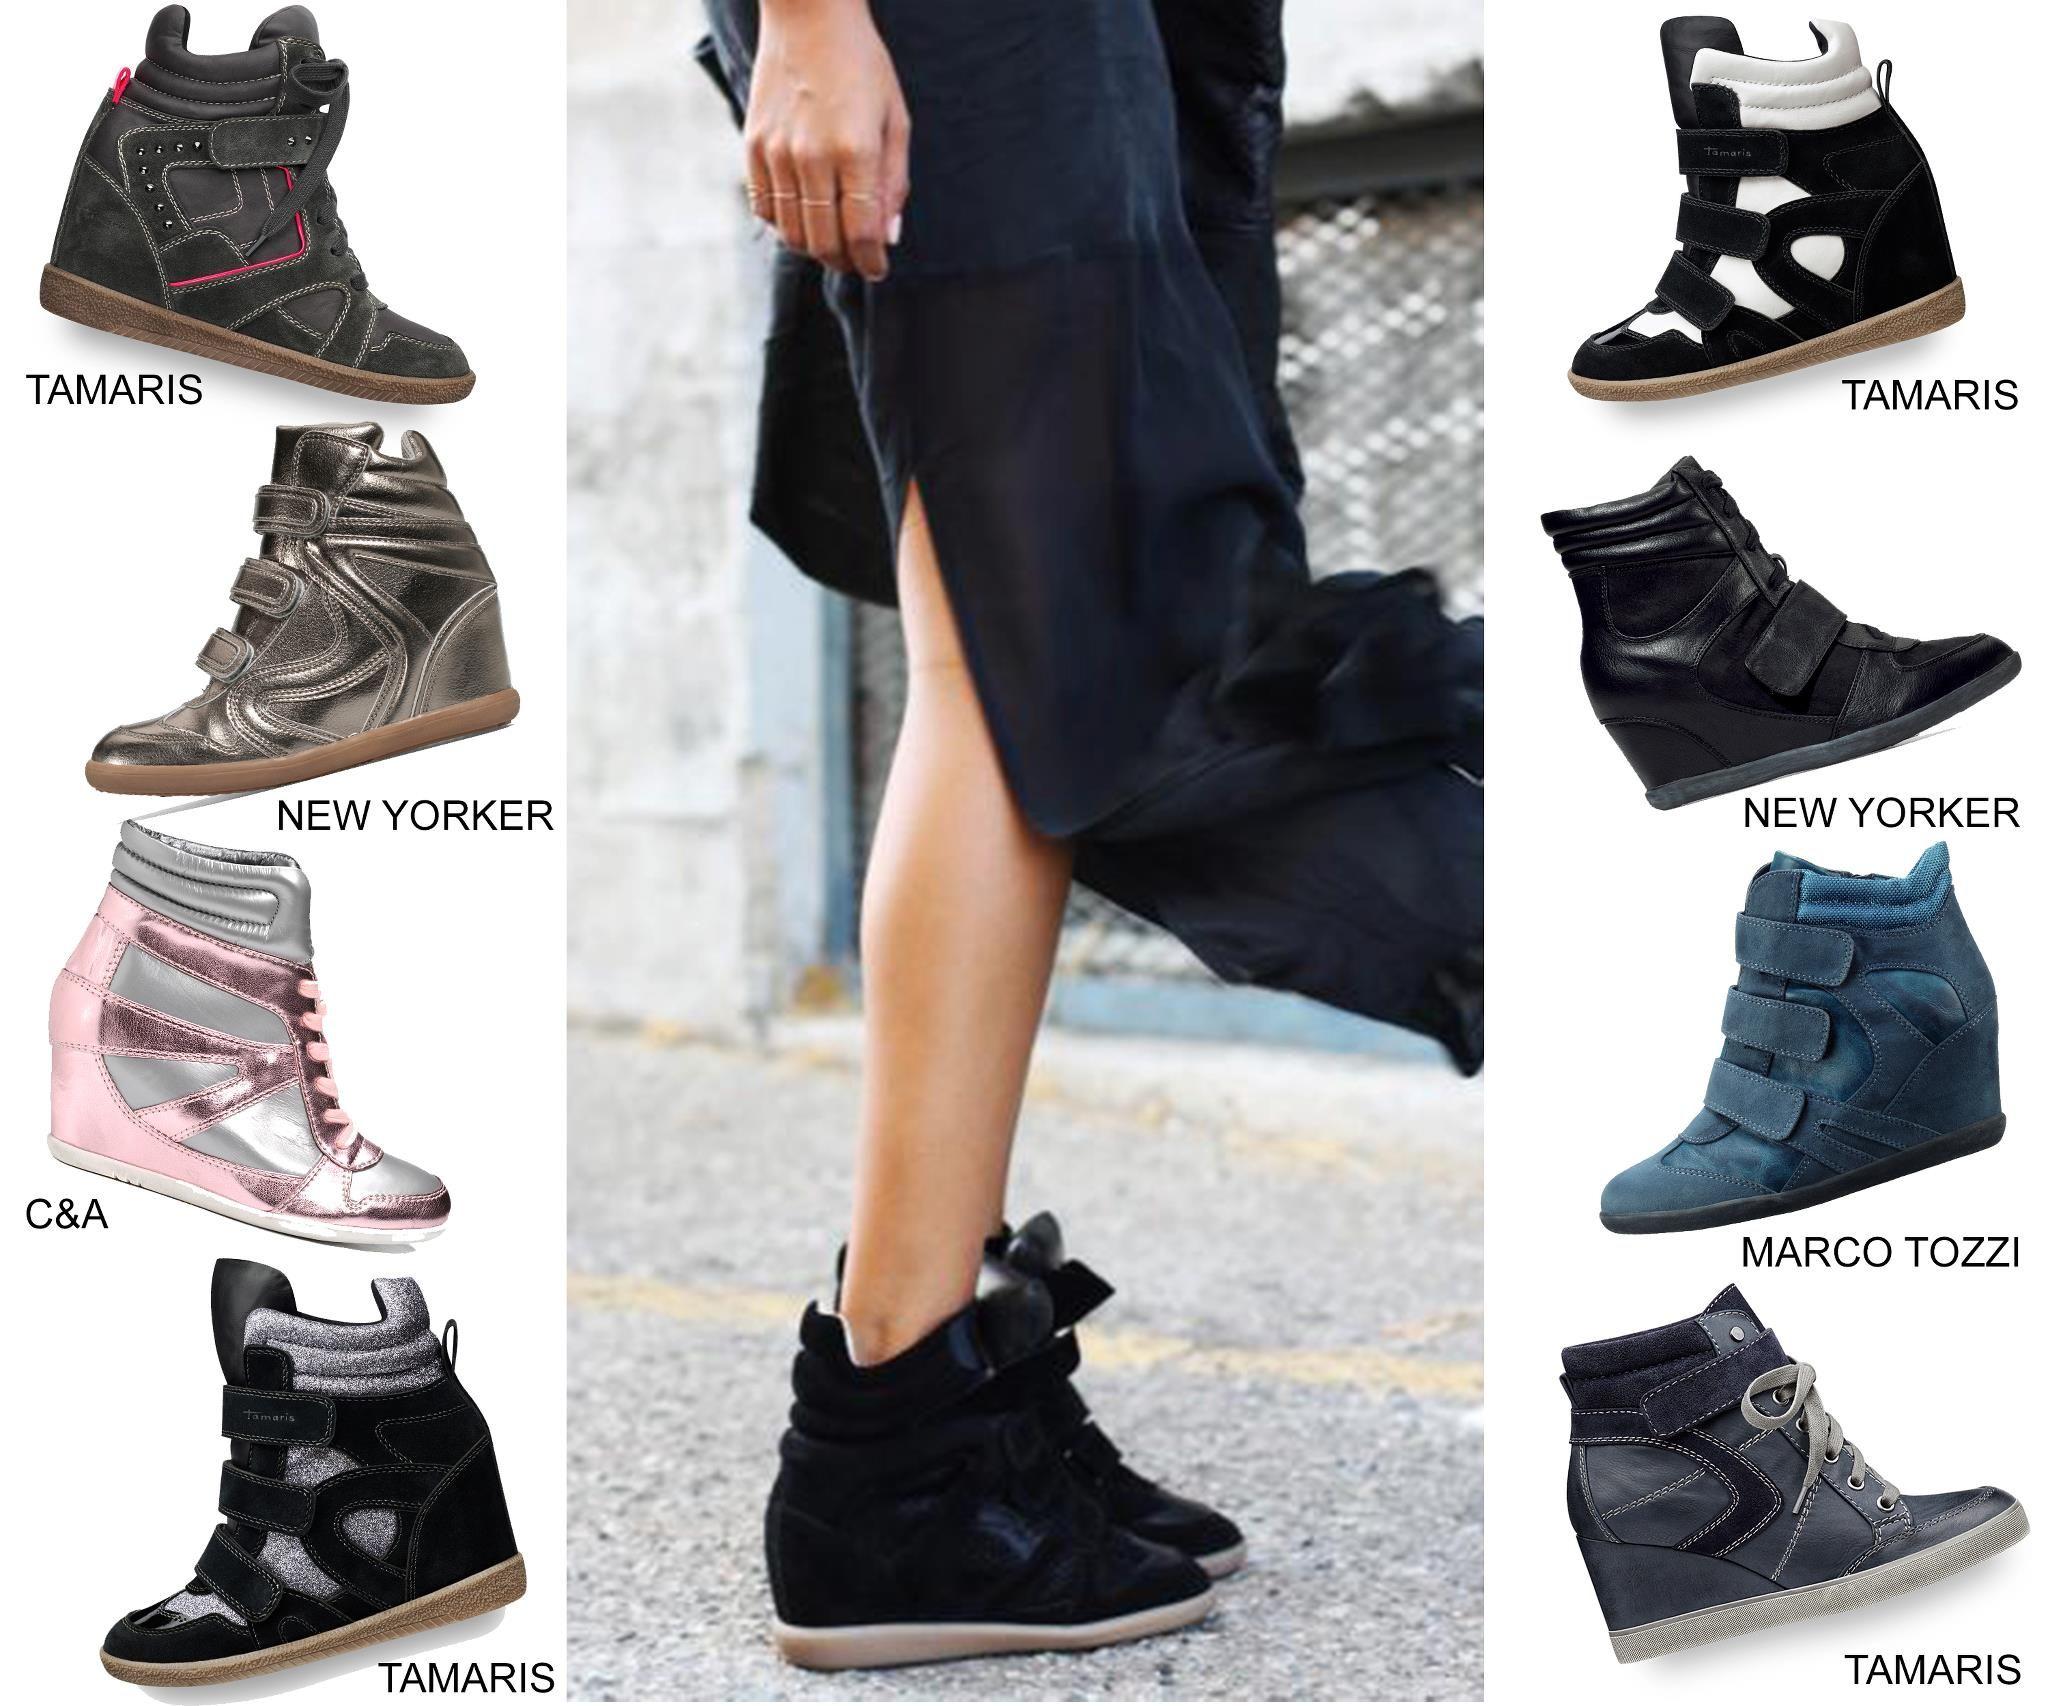 sports shoes 7d2cb 9efed Shoes Isabel Marant, Tamaris, Marco Tozzi, C | OUR BRANDS ...